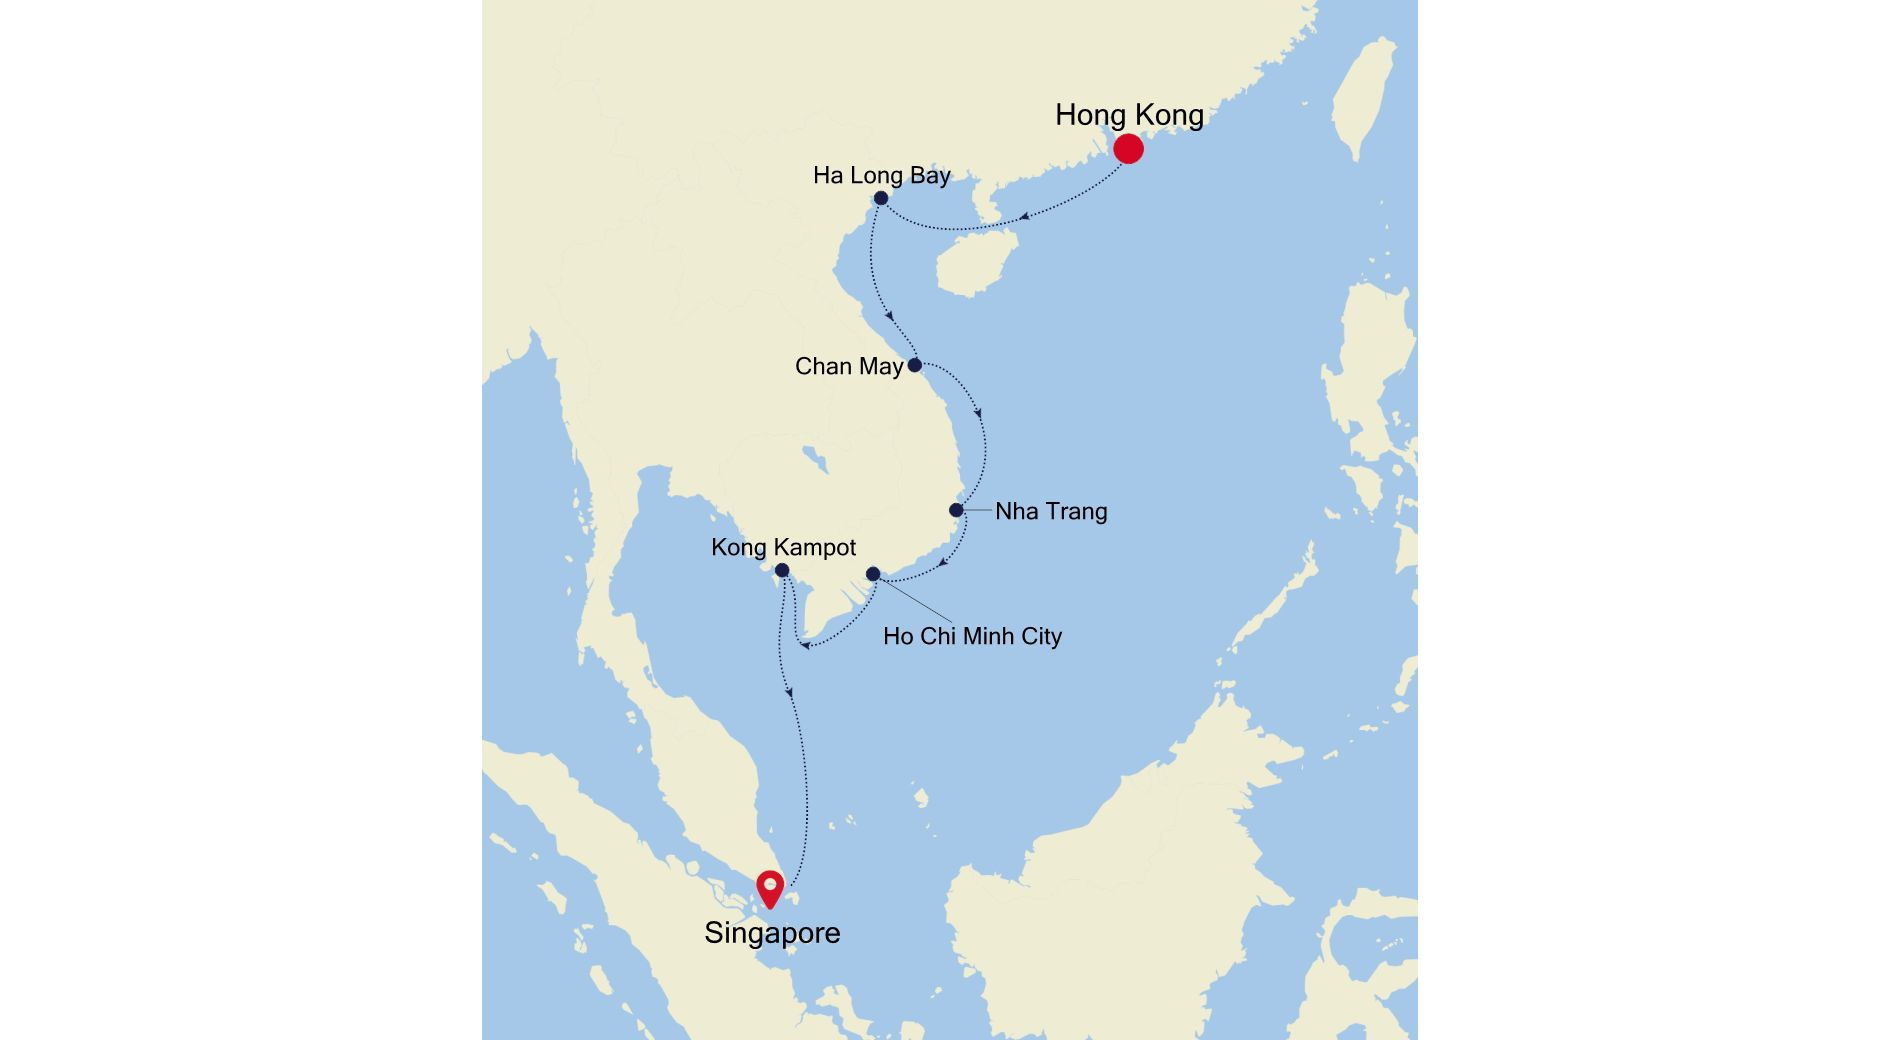 MO211221015 - Hong Kong a Singapore